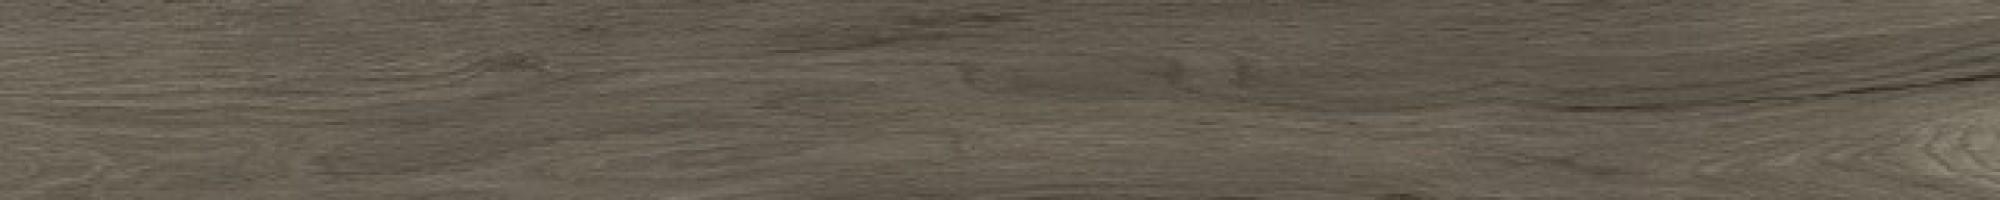 Керамогранит Ragno Woodclassic Tortora 10/13x100 R5RY